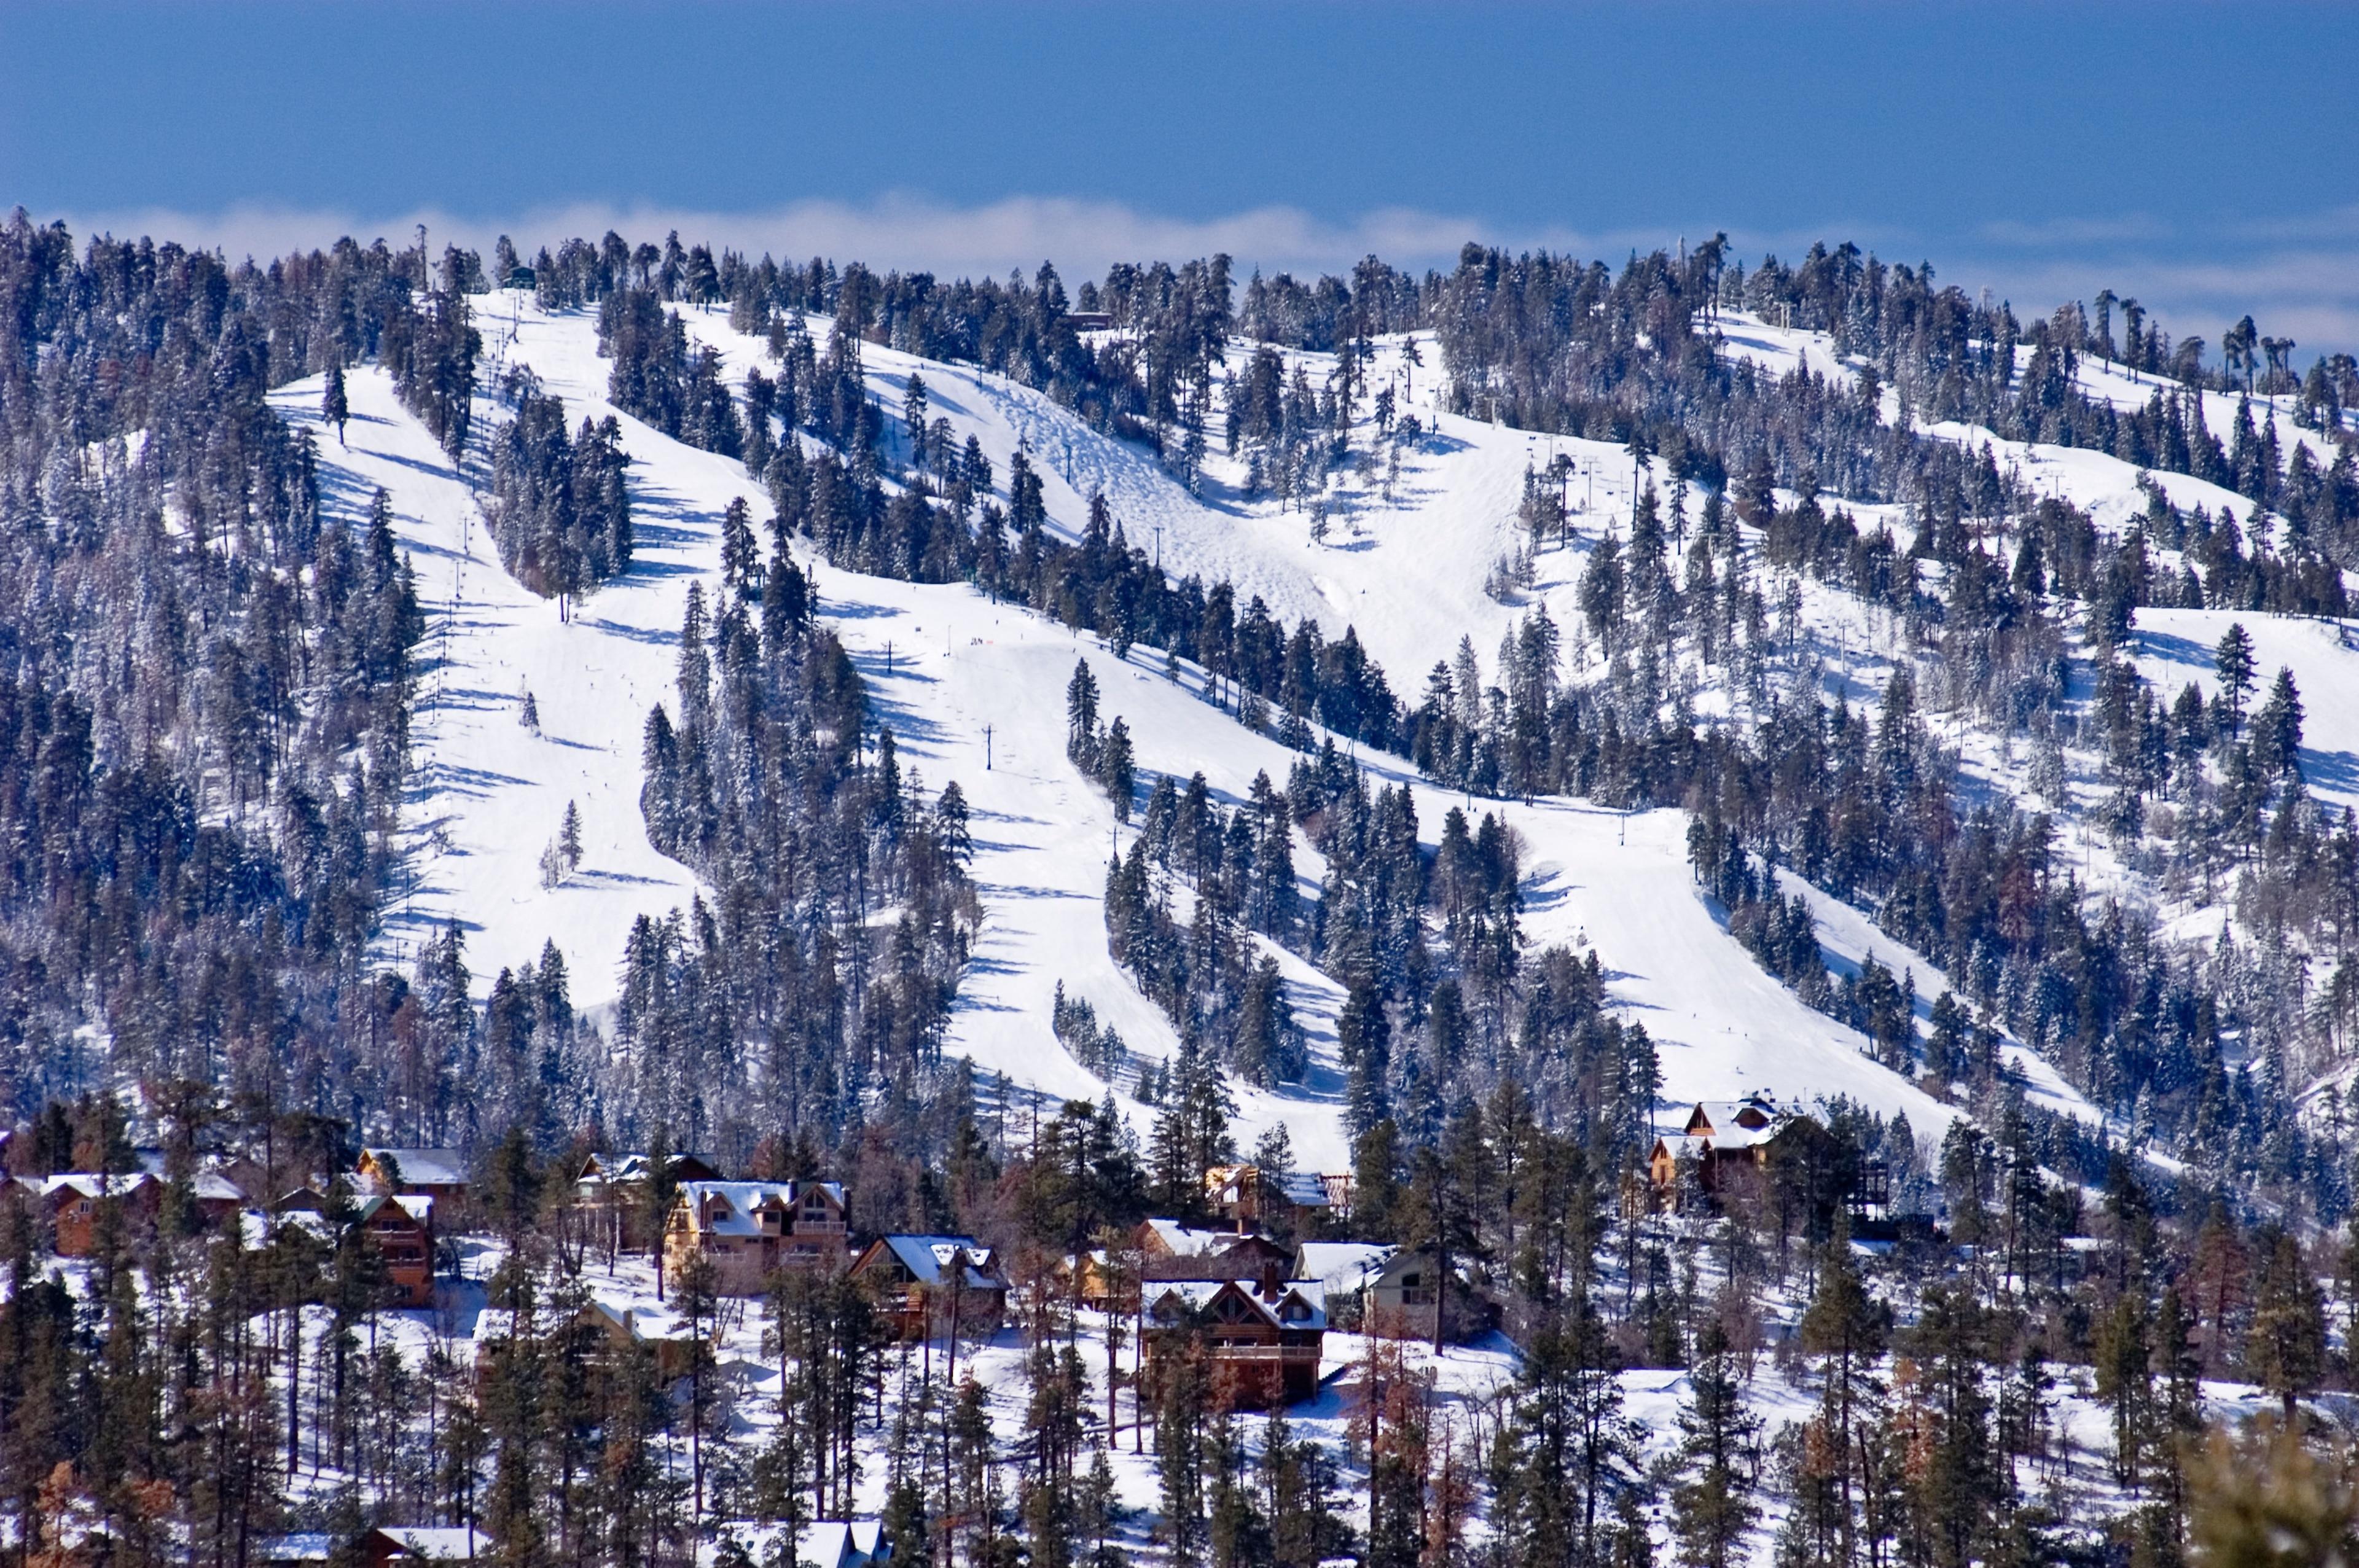 Snow Summit, Big Bear Lake, California, United States of America